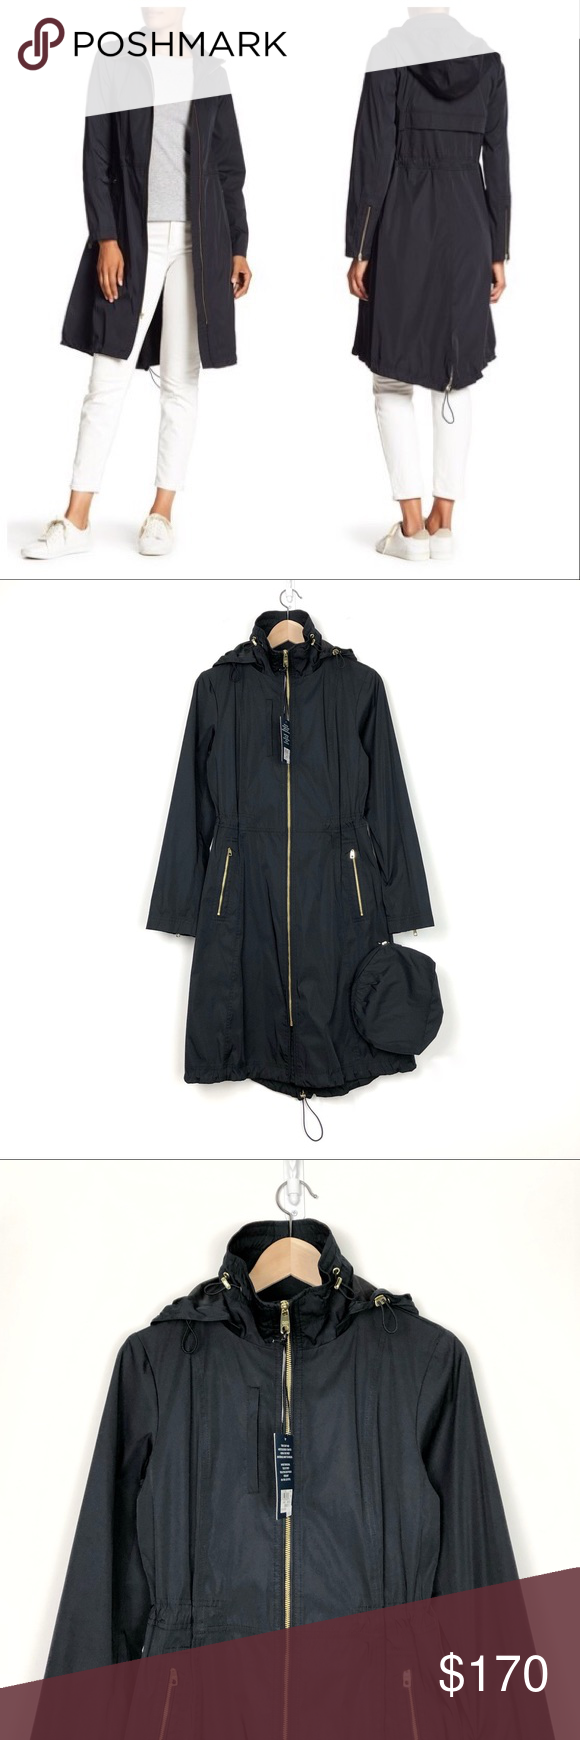 Cole haan single breasted metallic raincoat